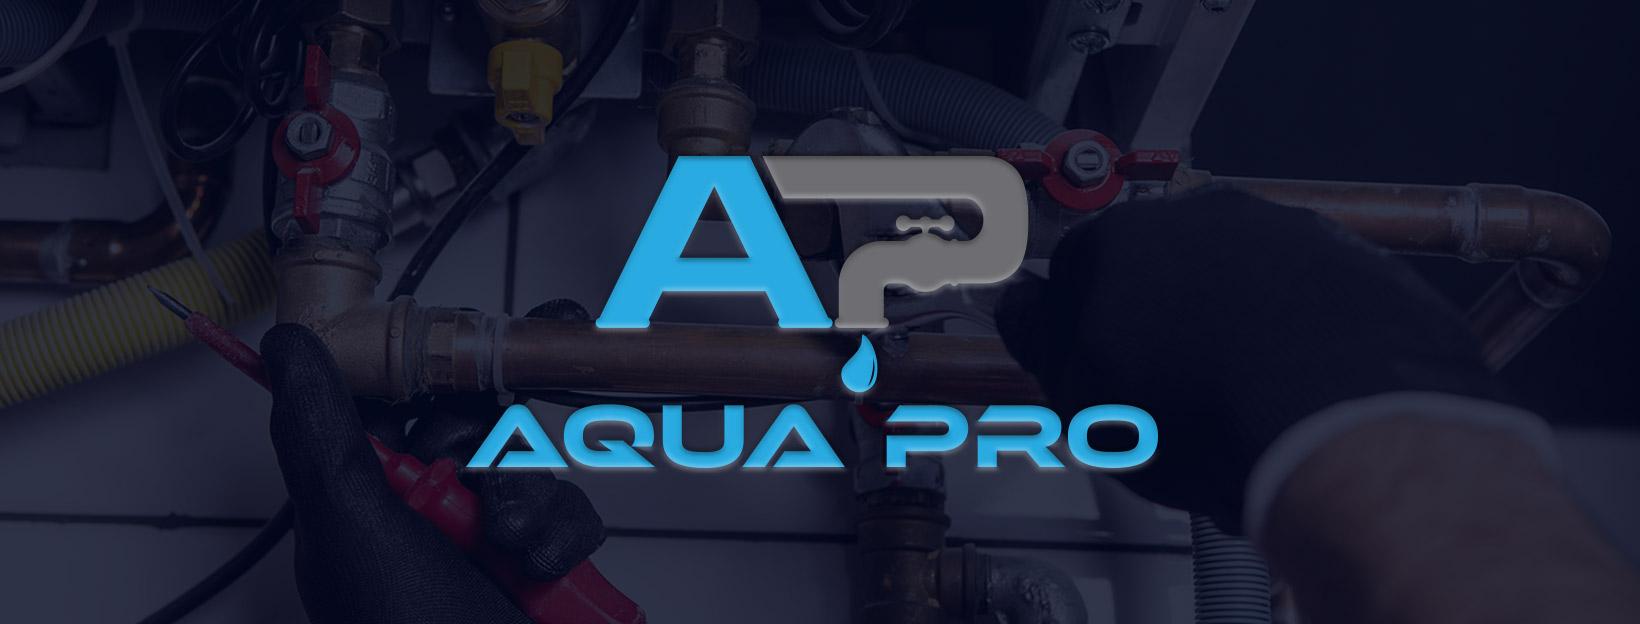 AQUA PRO PLUMBING CONTRACTOR / WATER DAMAGE RESTORATION reviews | Plumbing at 13327 SW 135th Ave - Miami FL